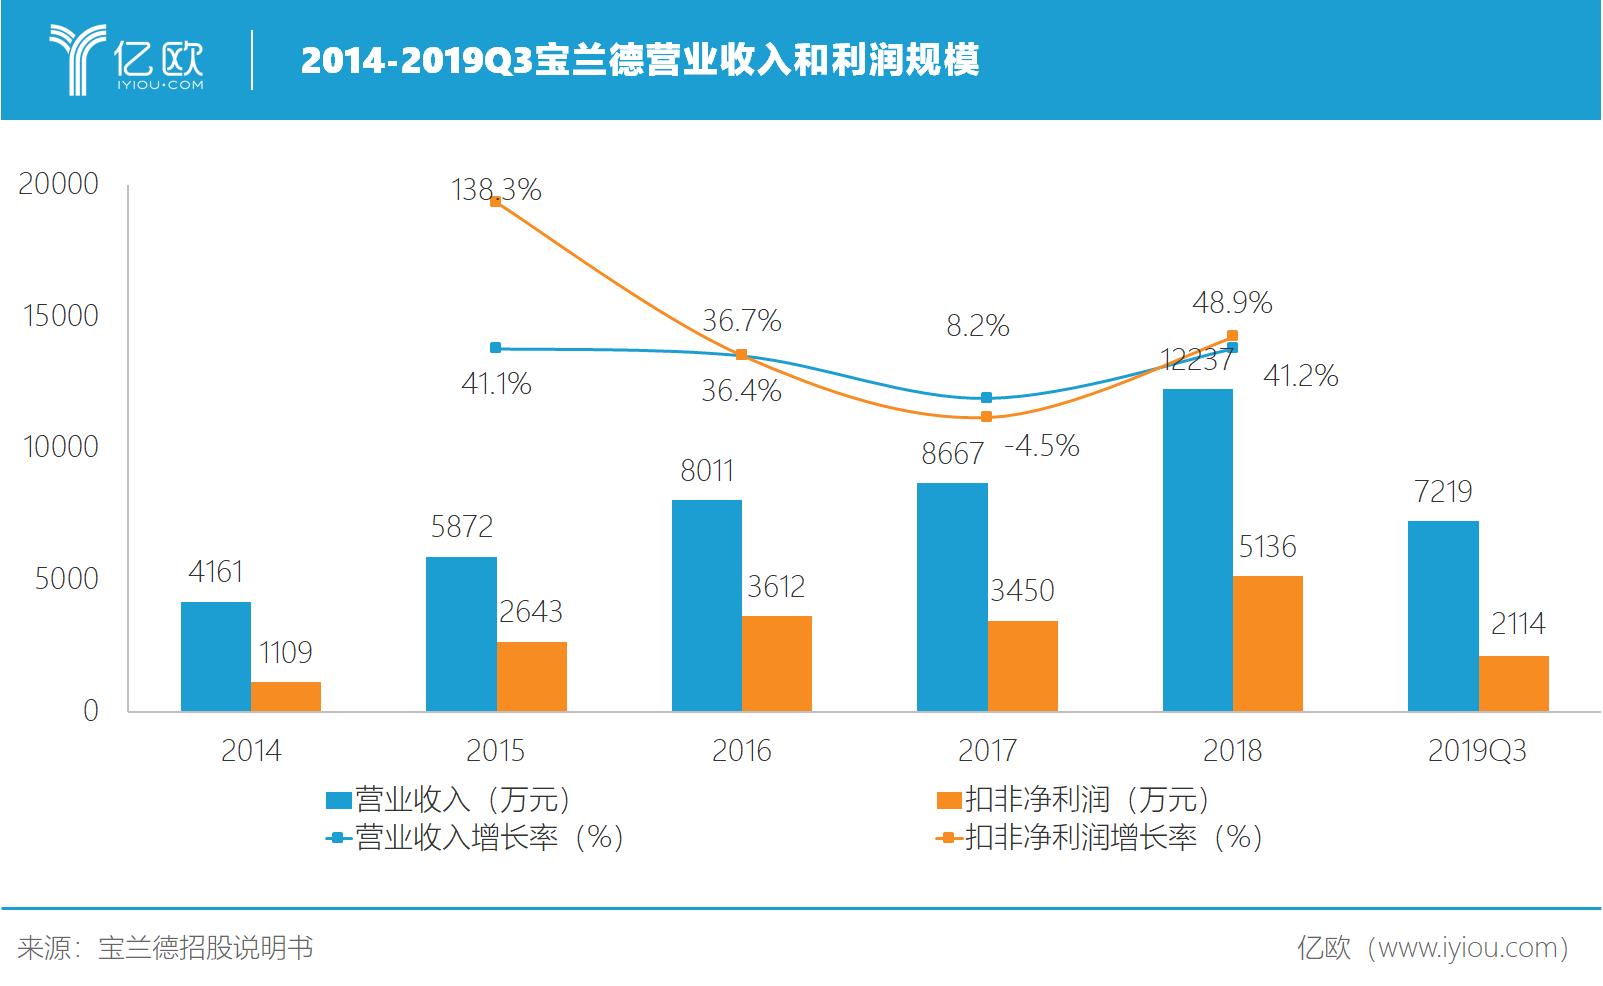 2014-2019Q3宝兰德营业收入和利润.png